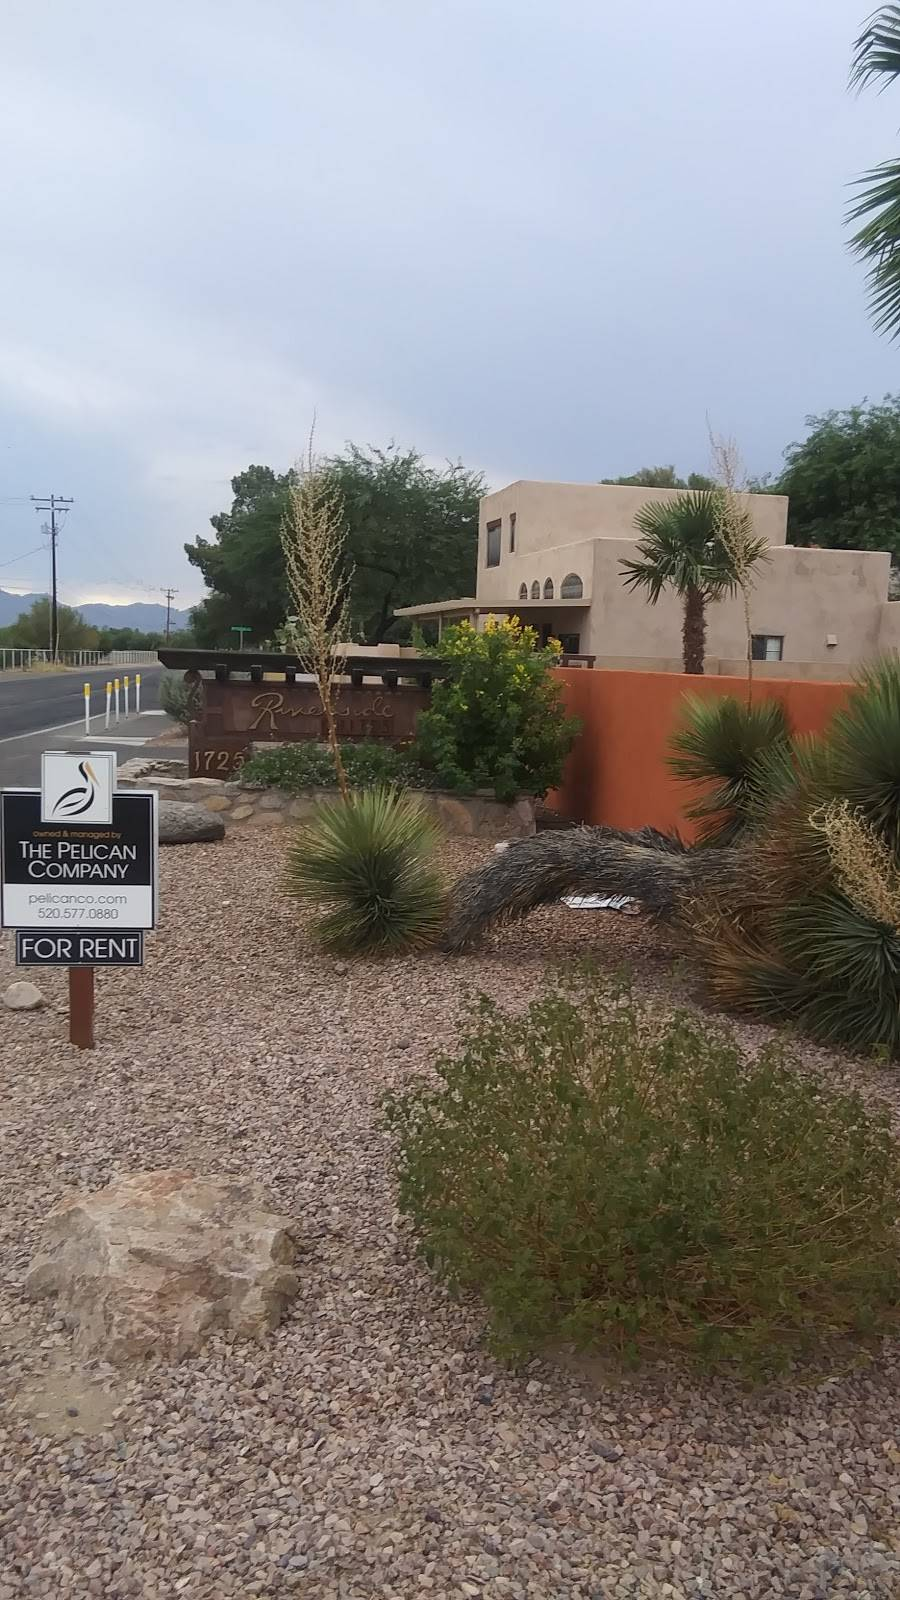 Riverside Suites - real estate agency    Photo 1 of 10   Address: 1725 E Limberlost Dr, Tucson, AZ 85719, USA   Phone: (520) 202-2210